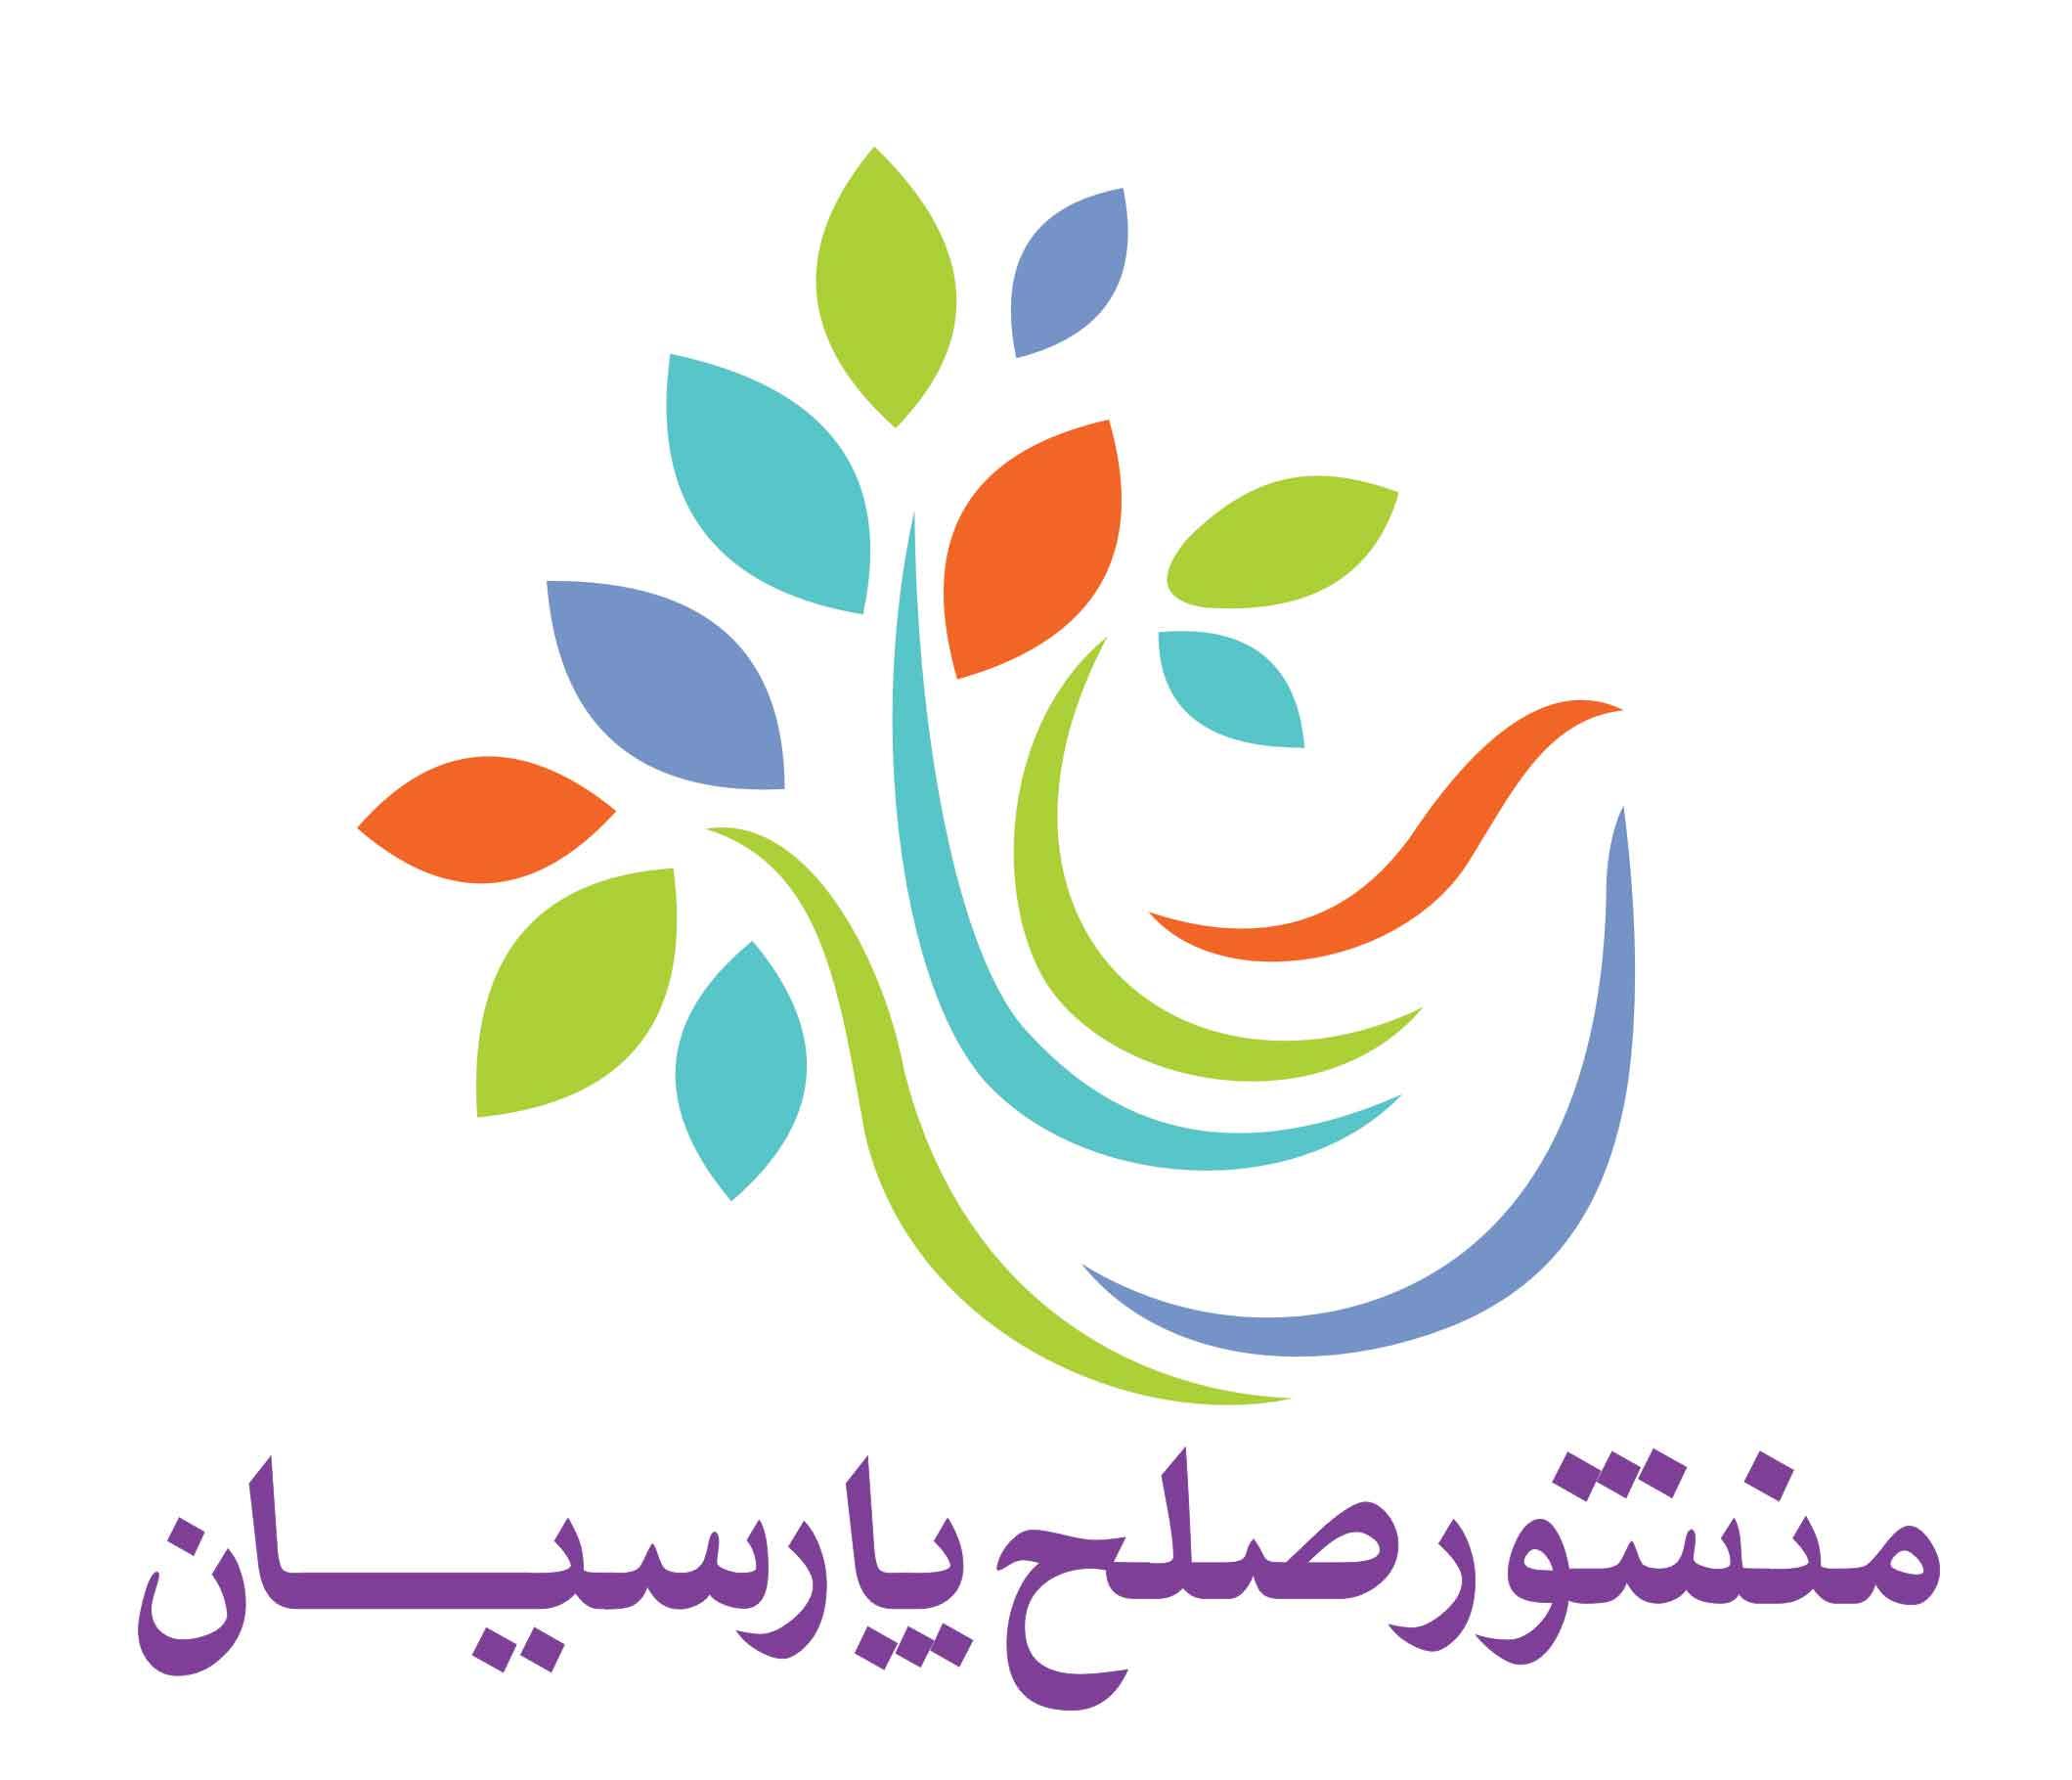 منشور صلح پارسیان